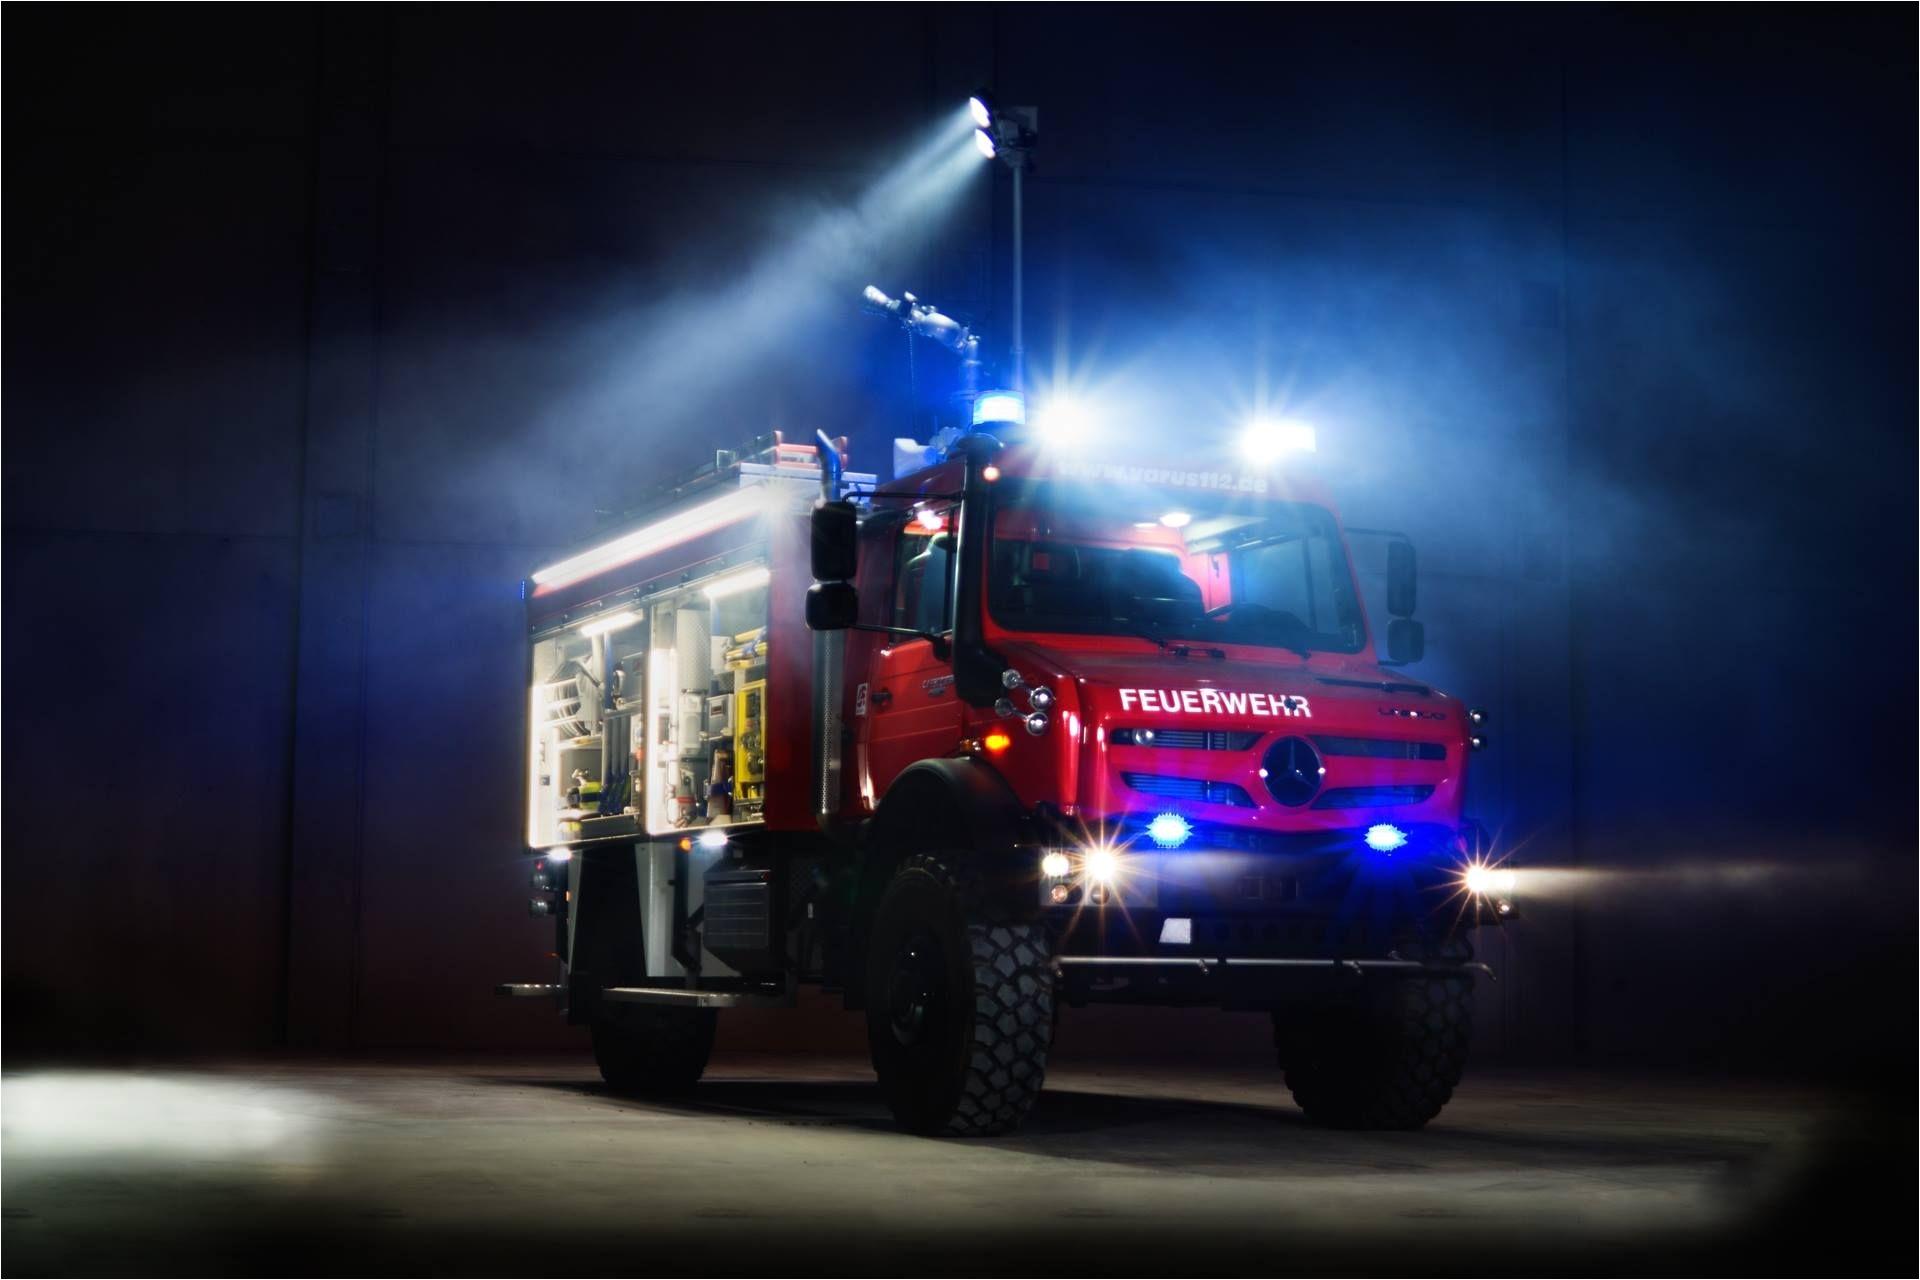 Volunteer Firefighter Lights Schlingmann112 De Feuerwehr 03 Pinterest Facebook